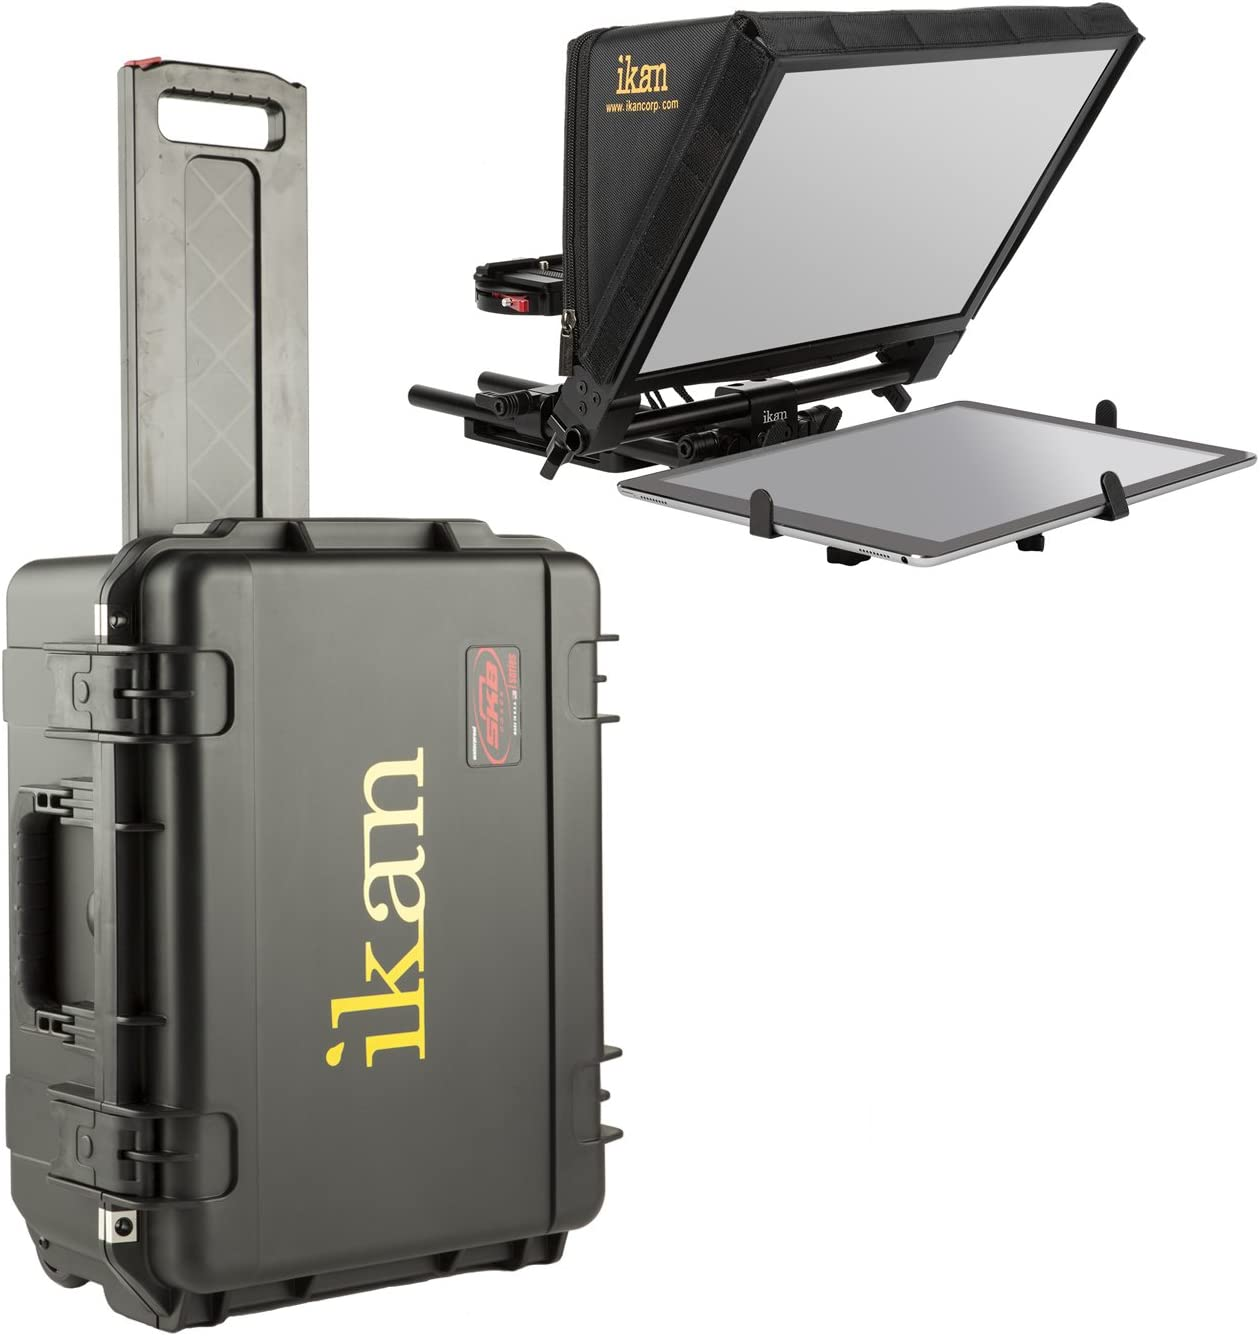 Ikan Elite Universal Large Tablet Teleprompter for Surface Pro & Ipad Pro, Beam Splitter 70/30 Glass, w/Rolling Case (PT-Elite-PRO-TK) - Black